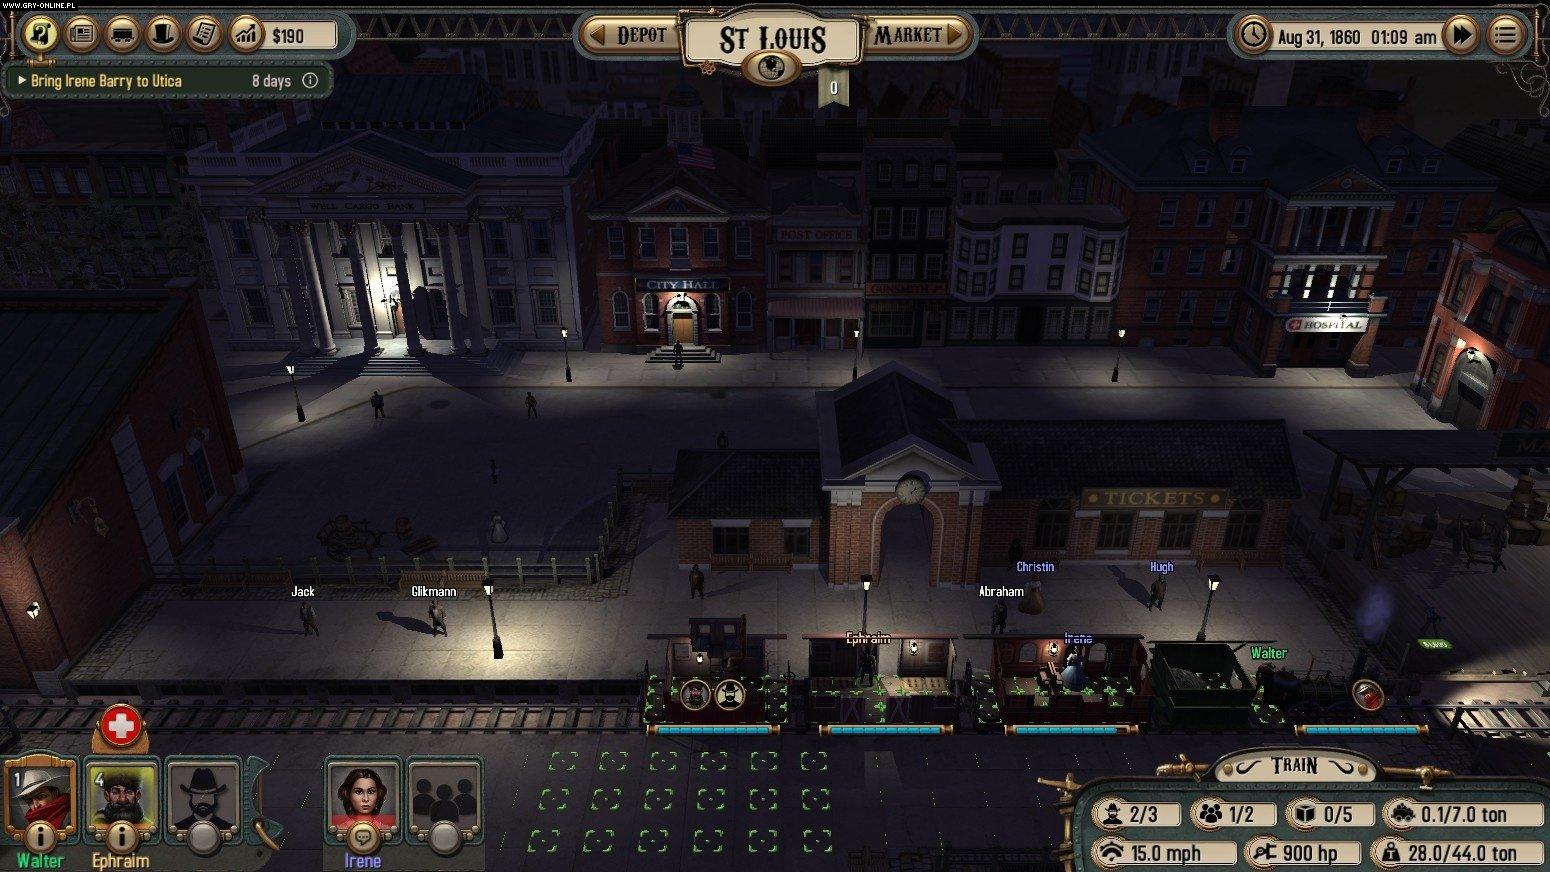 Bounty Train PC Games Image 4/26, Corbie Games, Daedalic Entertainment